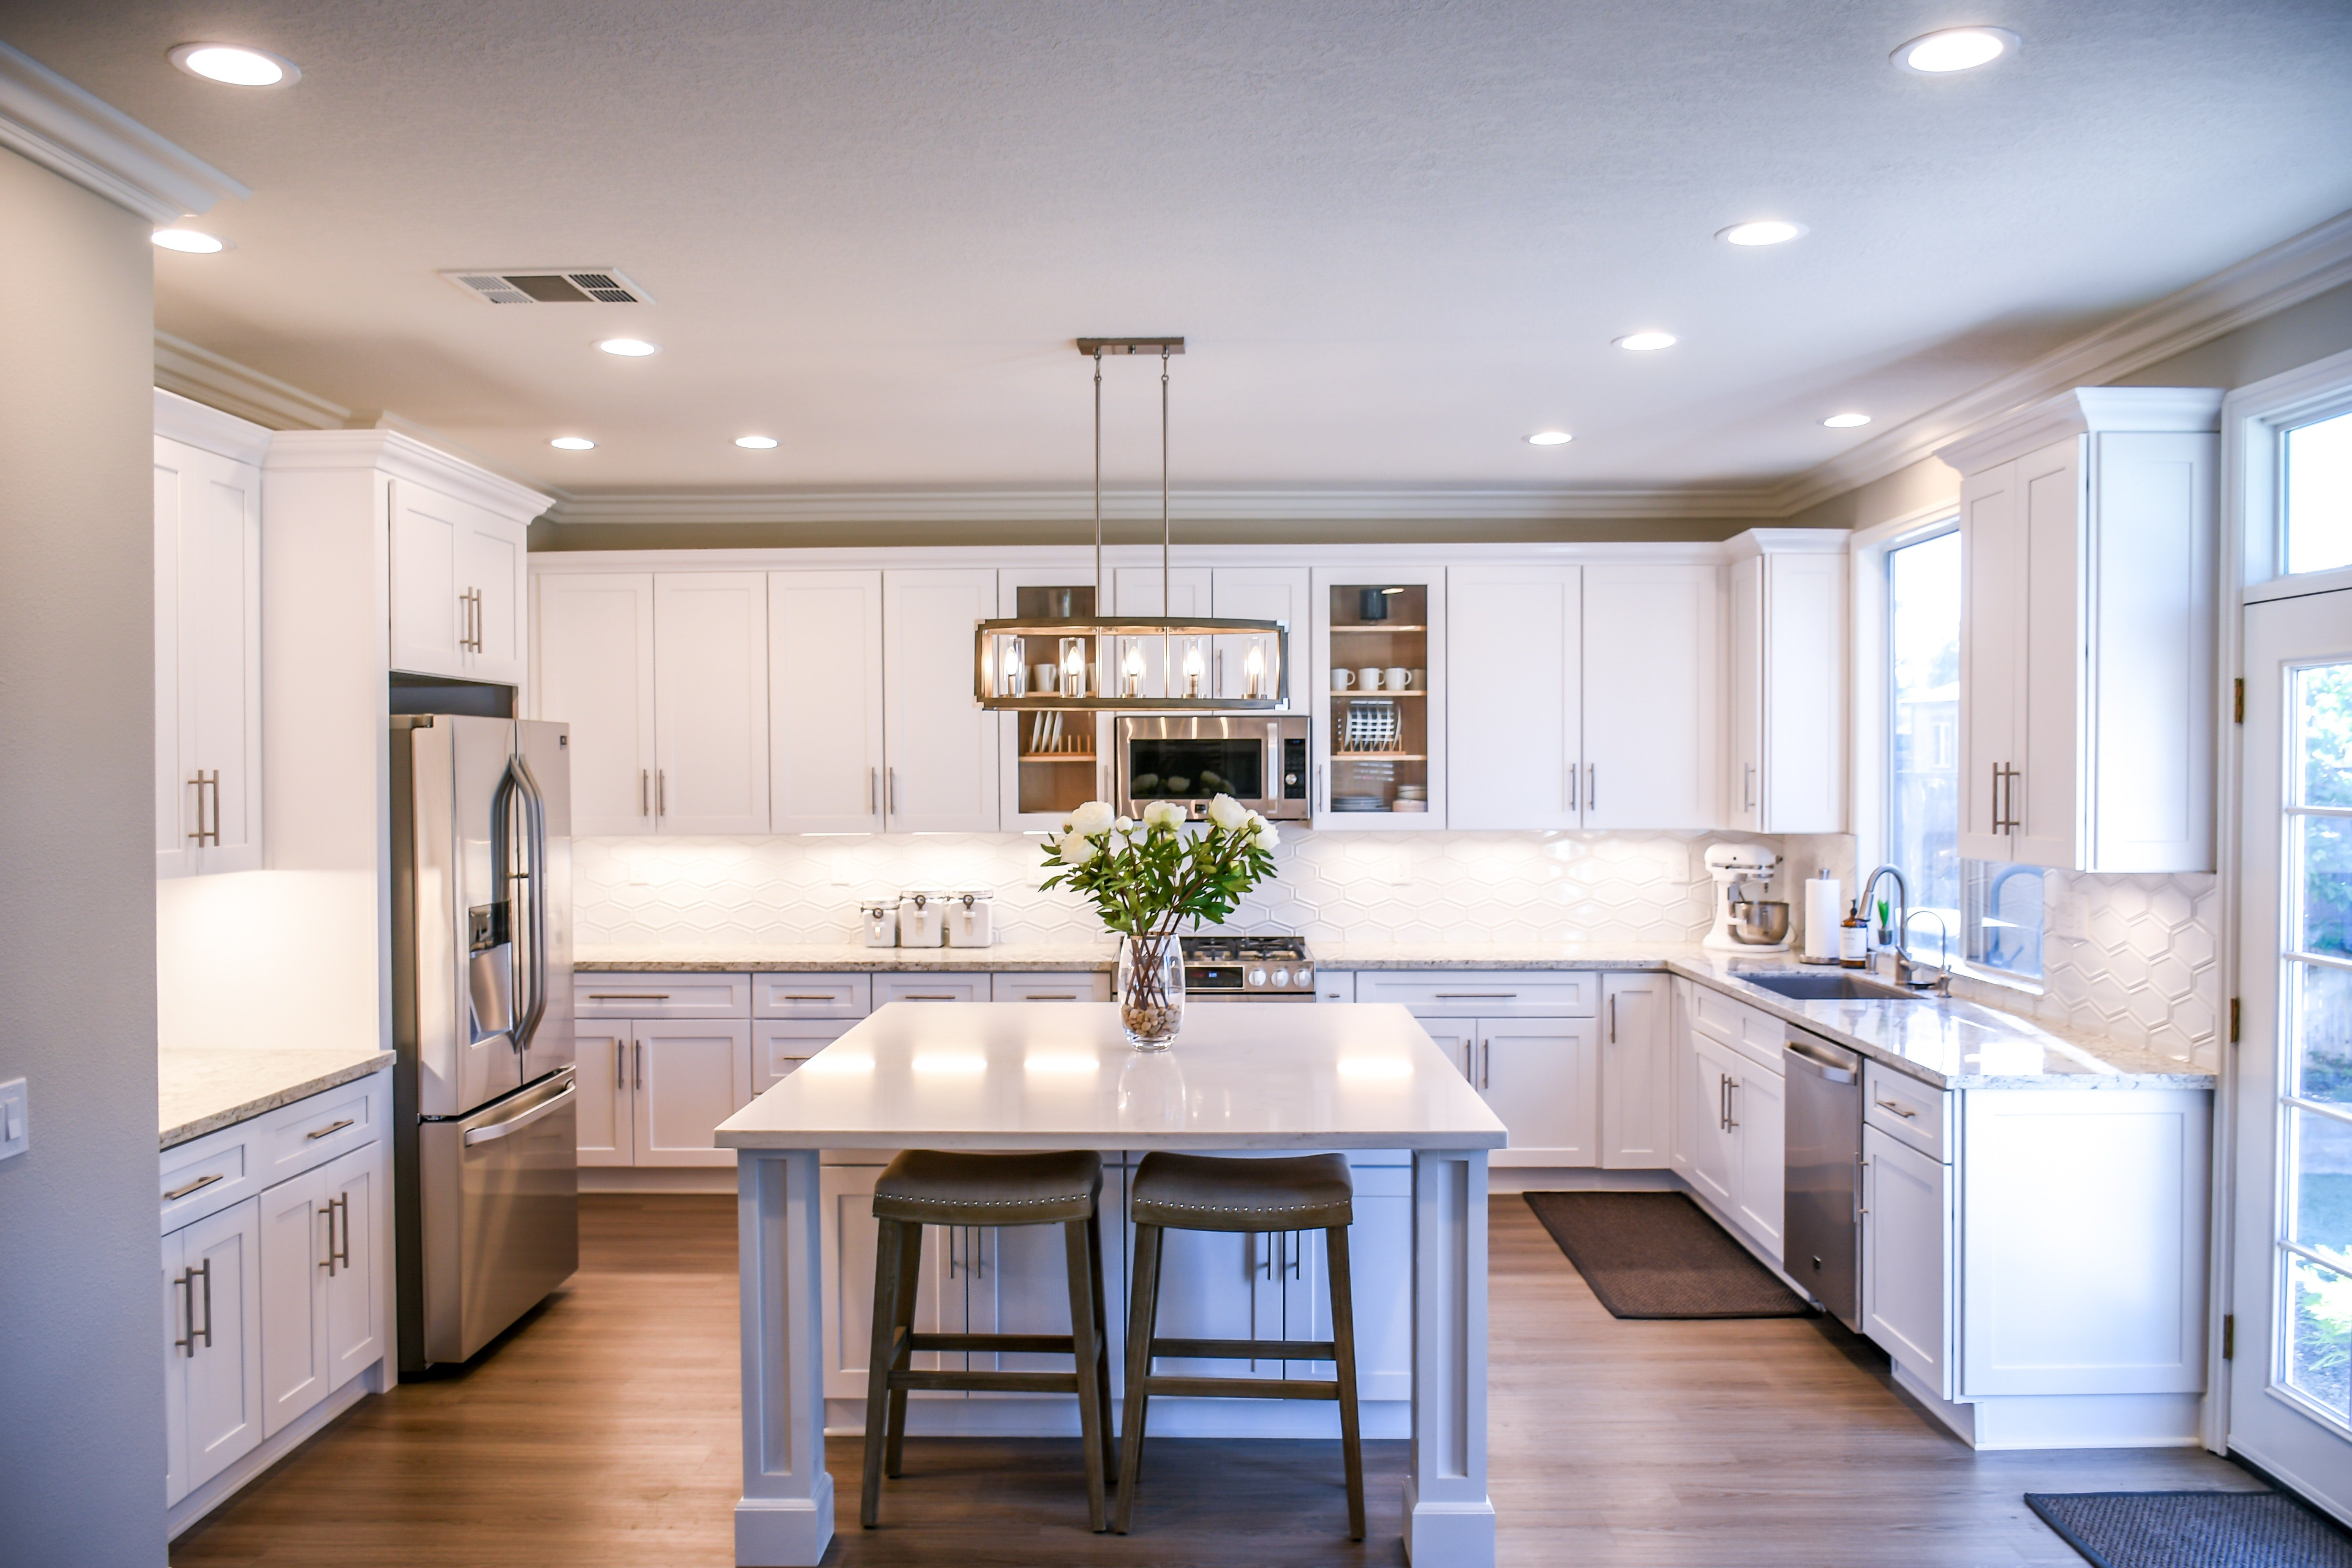 Design Kitchen Cabinet Design Quartz Countertops Surrey